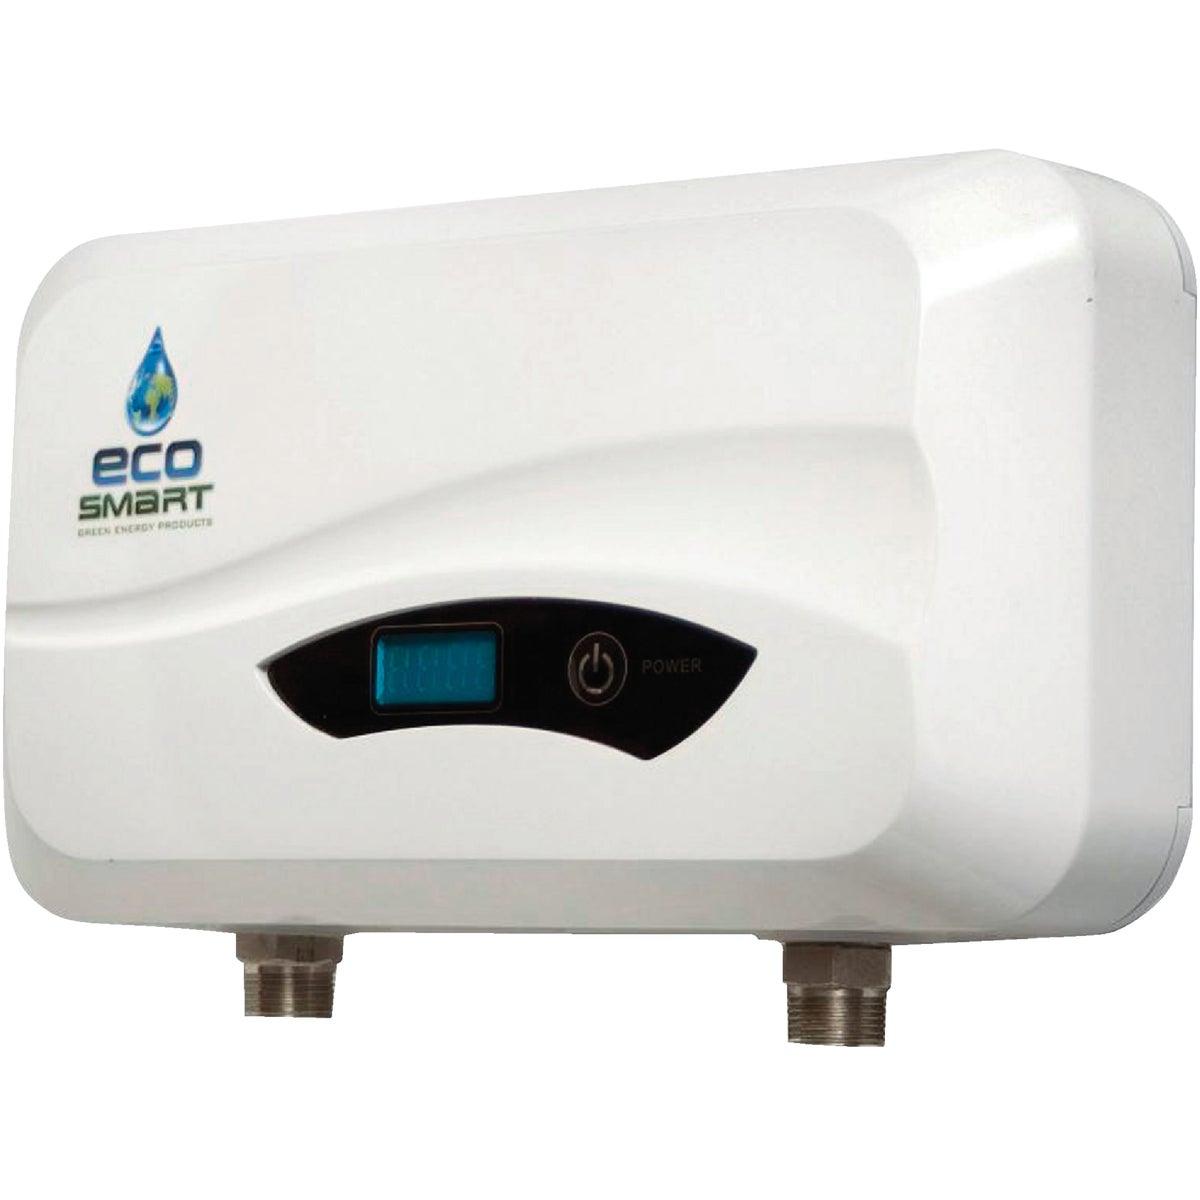 6KW 220V WATER HEATER